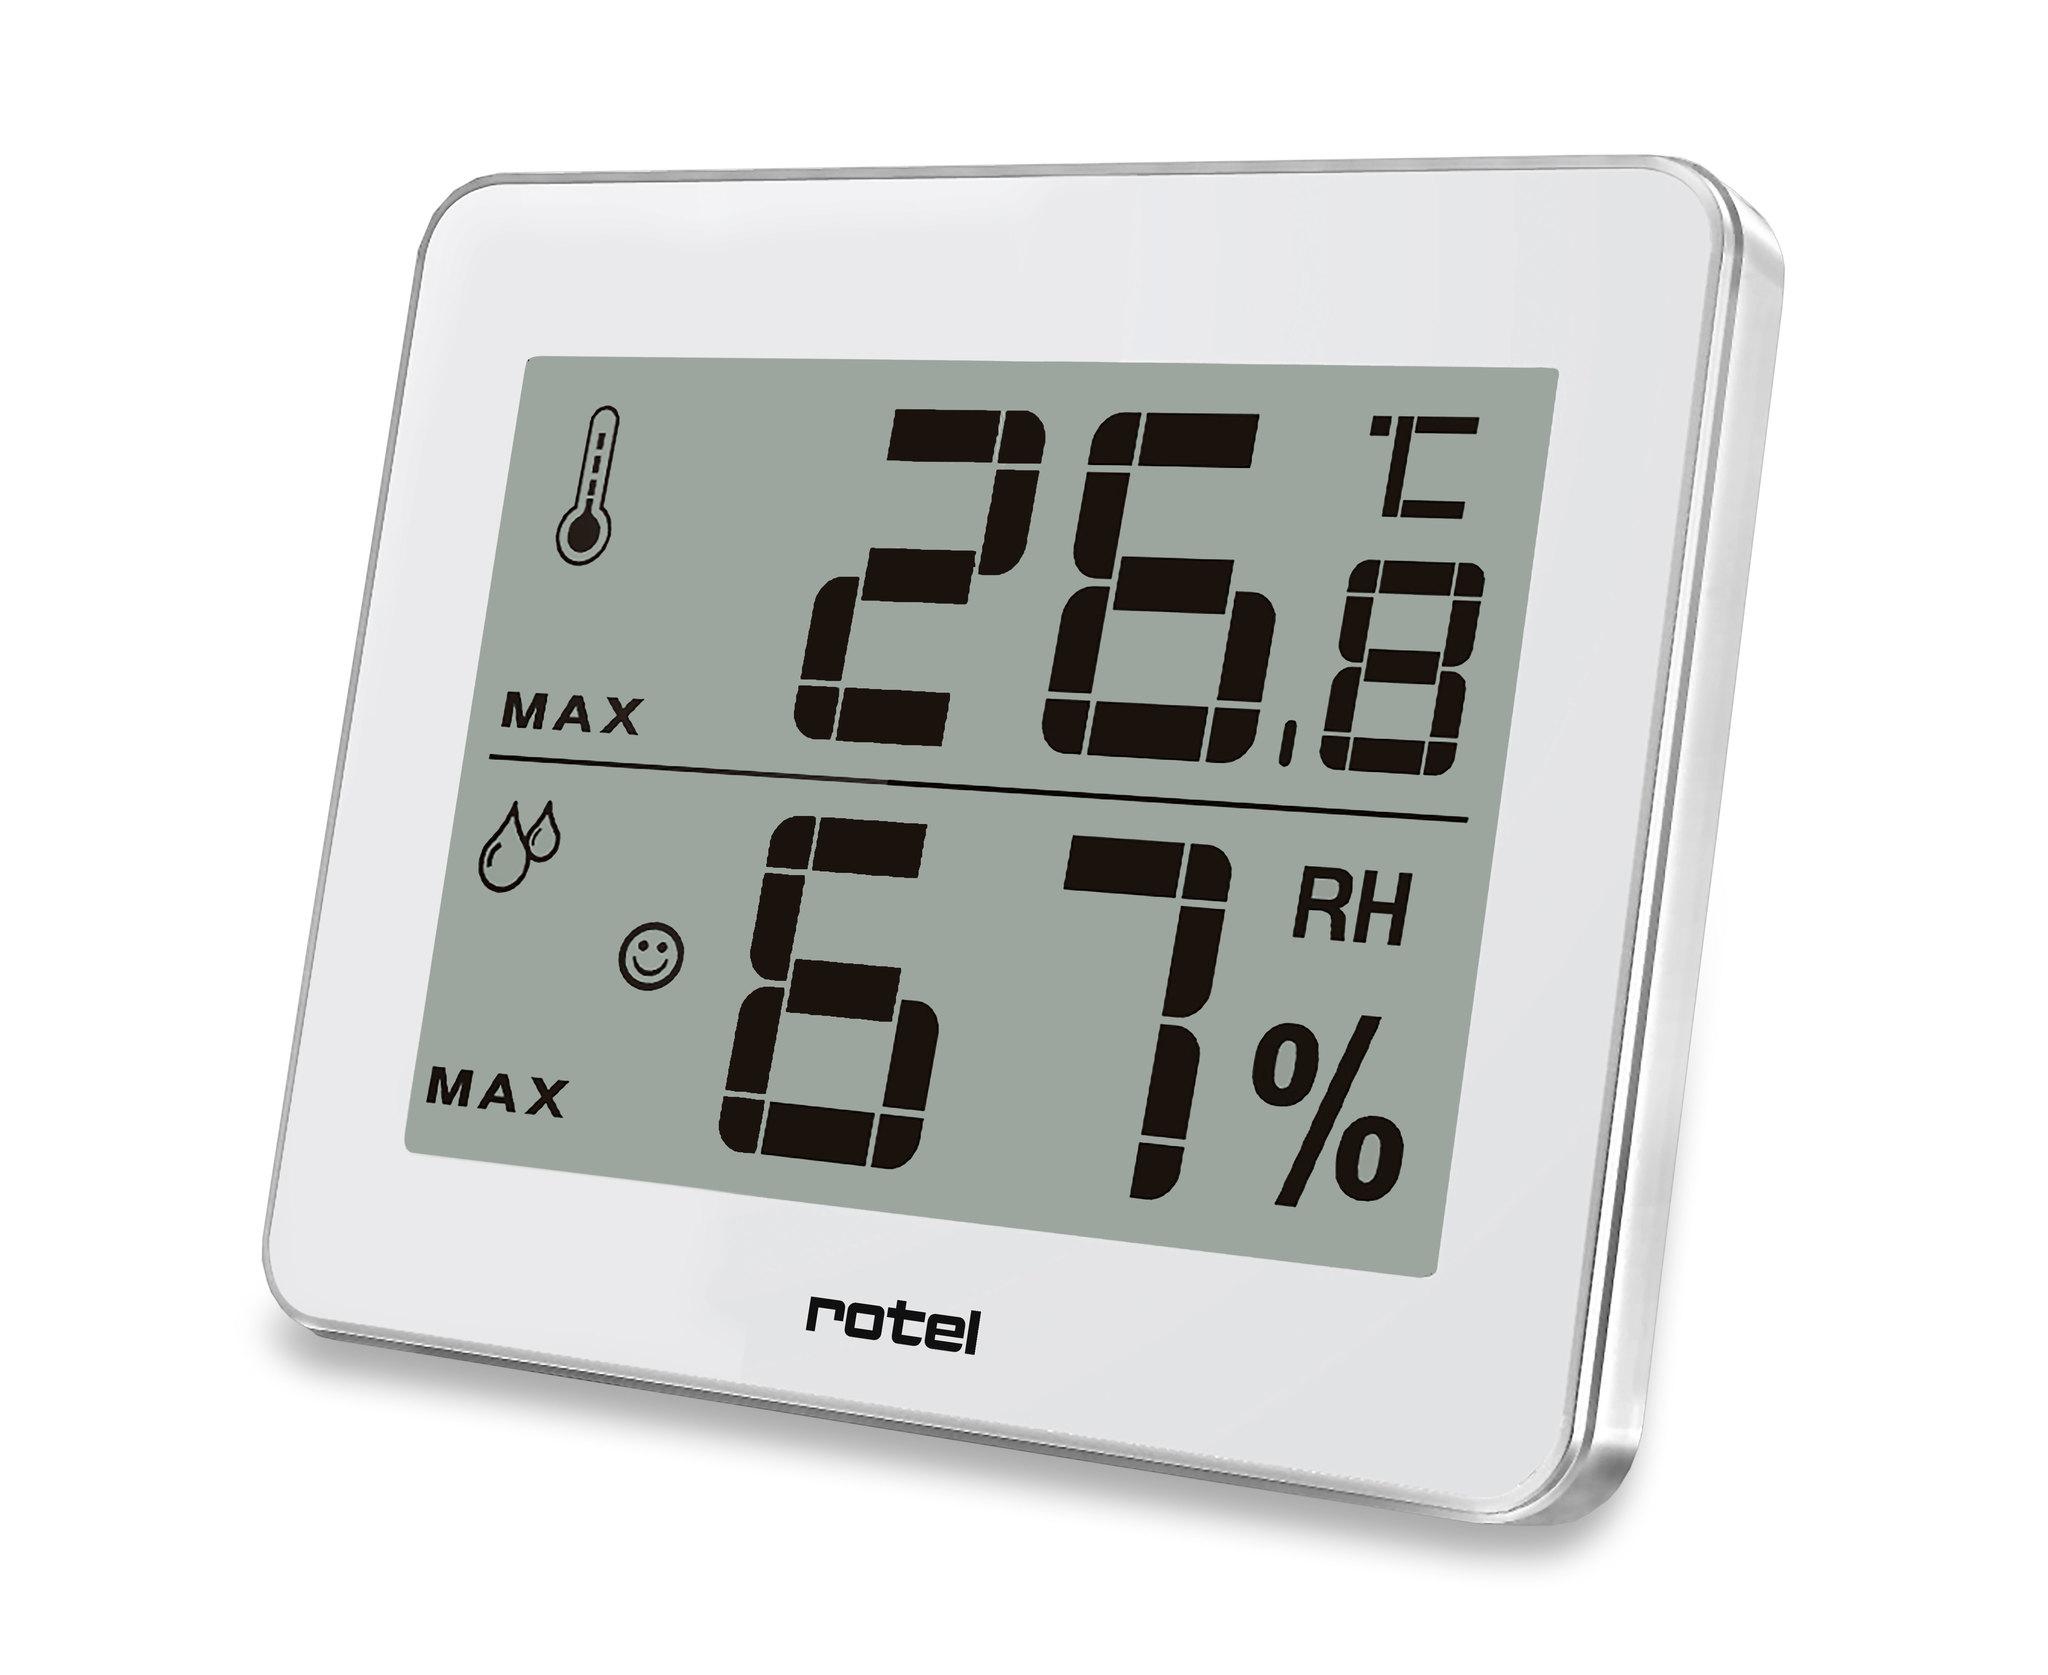 rotel Thermo-Hygrometer digital